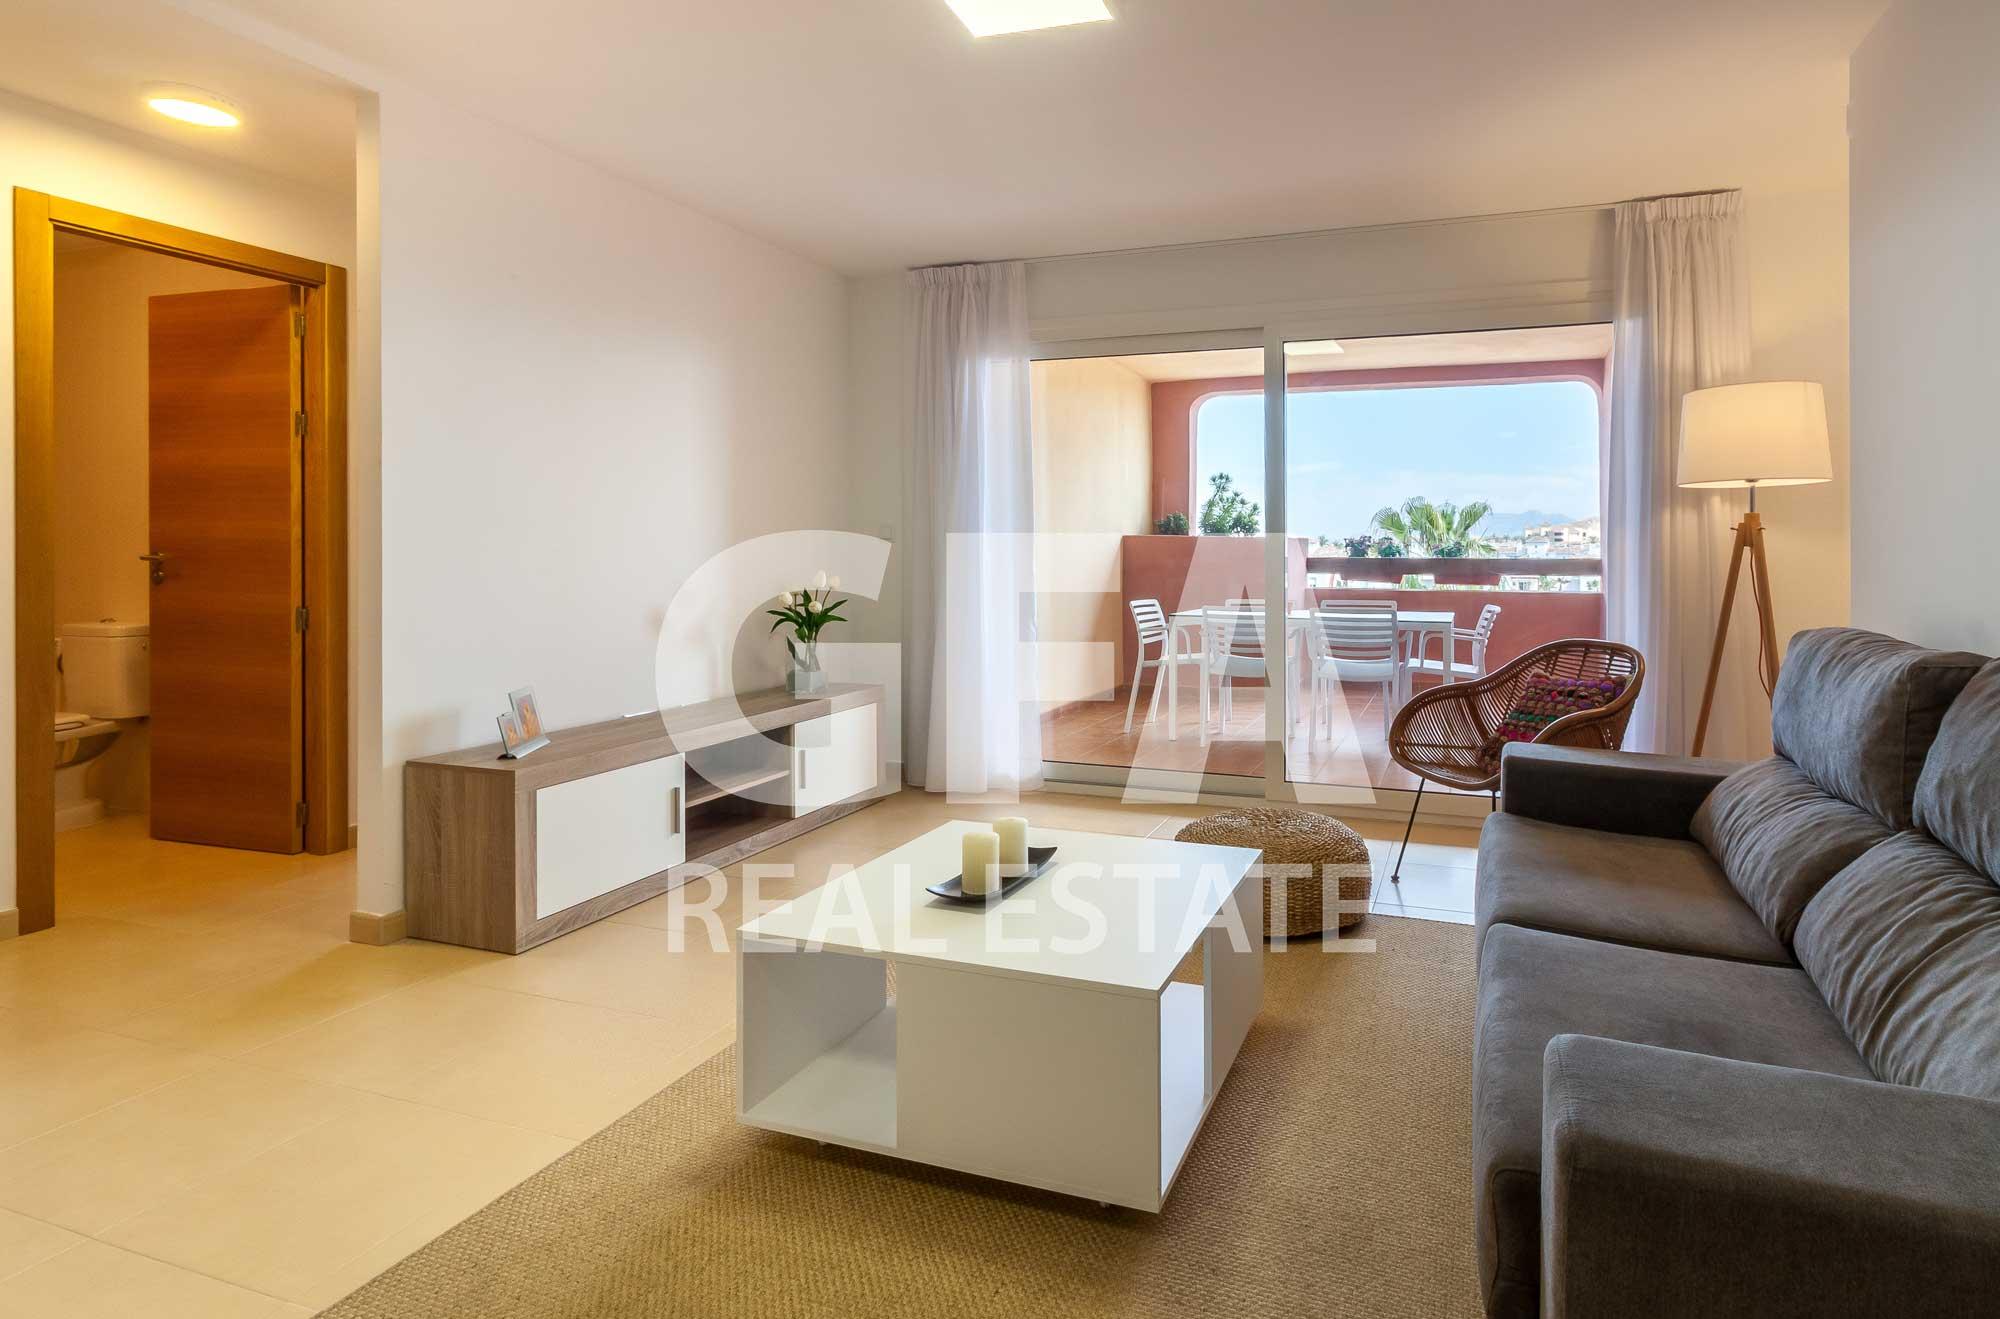 boulevard-viviendas-de-obra-nueva-resort-mar-menor (34)